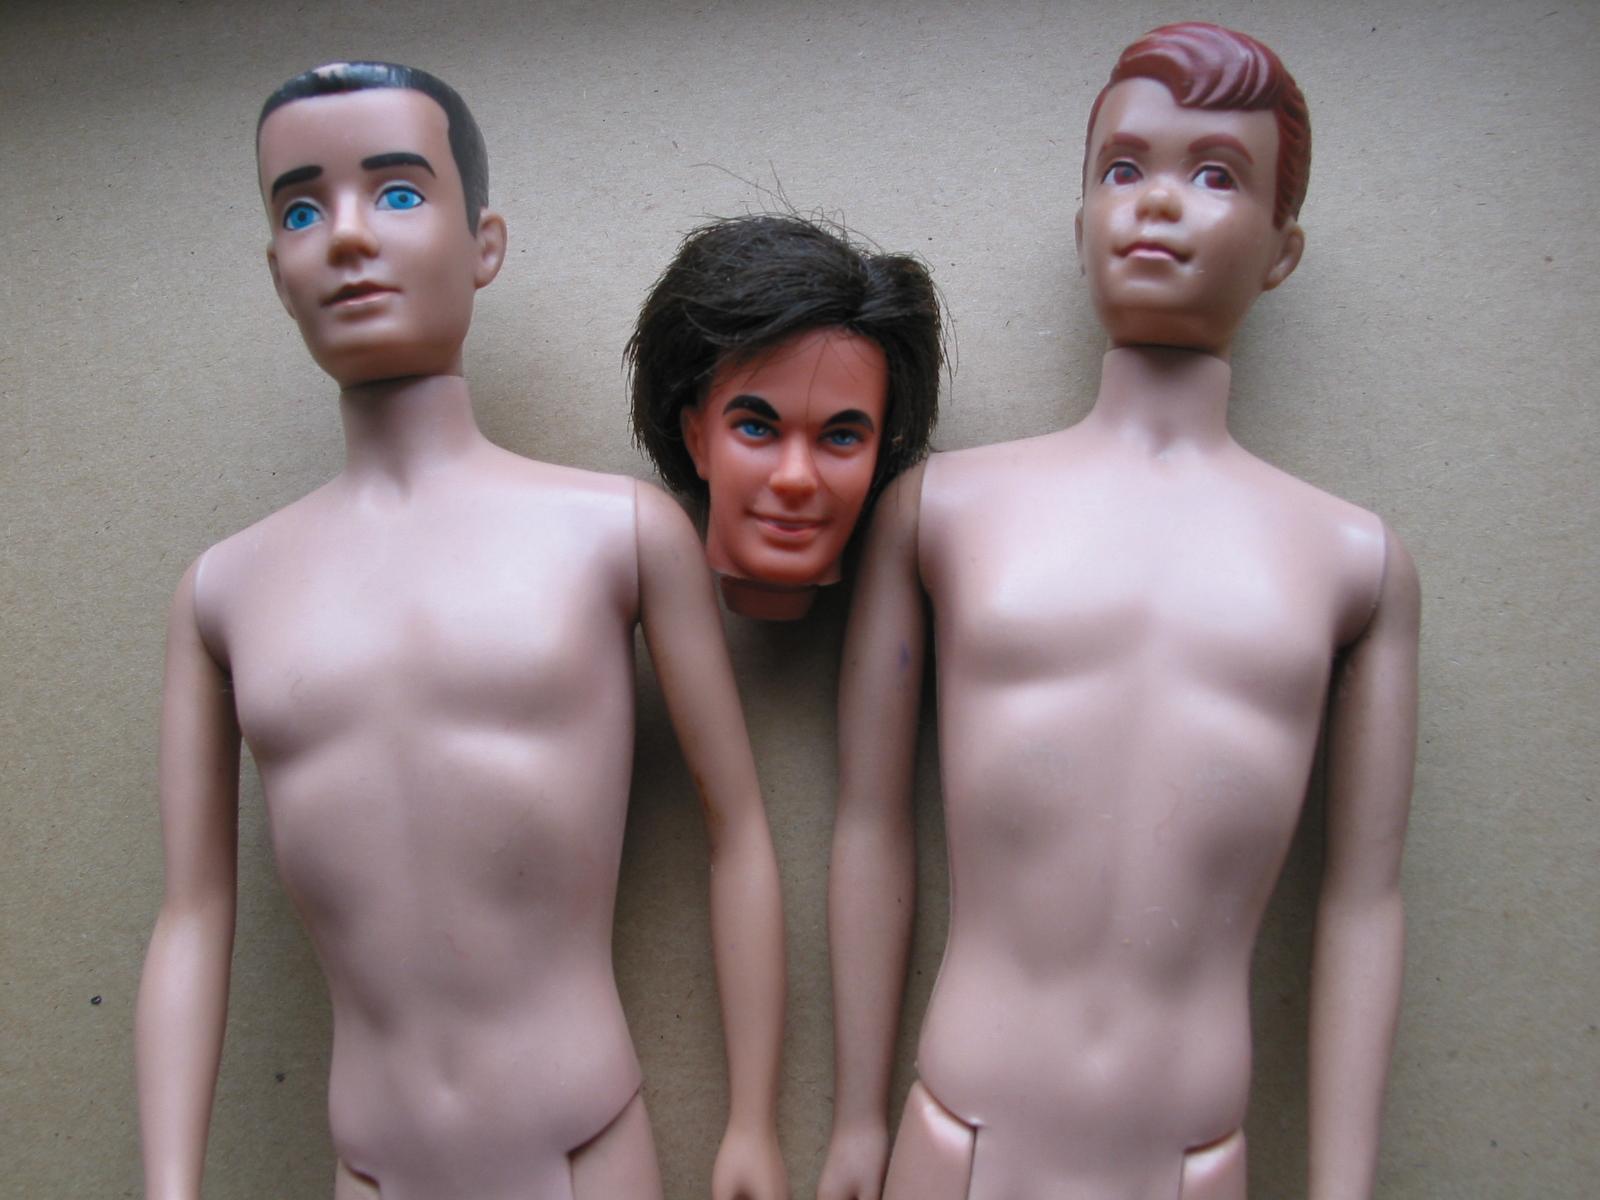 2 Mattel Male Dolls From Rubylane Sold On Ruby Lane